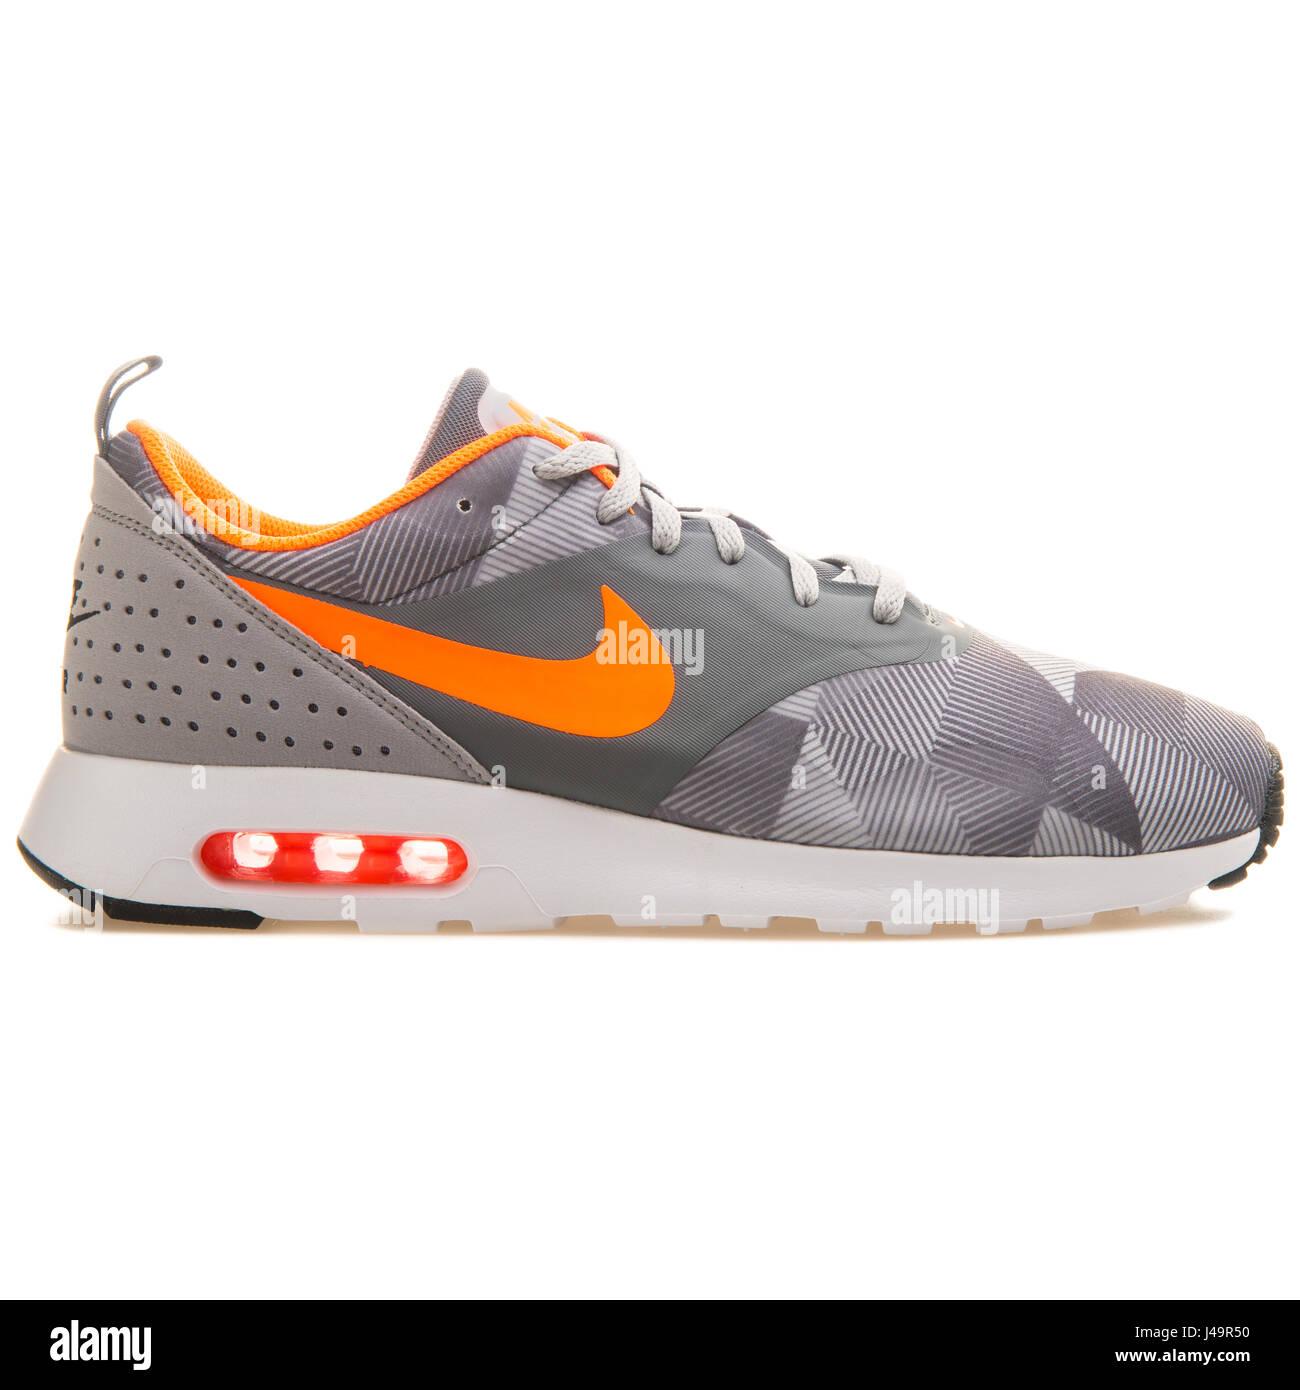 Nike Air Max Tavas Print Dark Grey Orange - 742781-018 Stock Photo